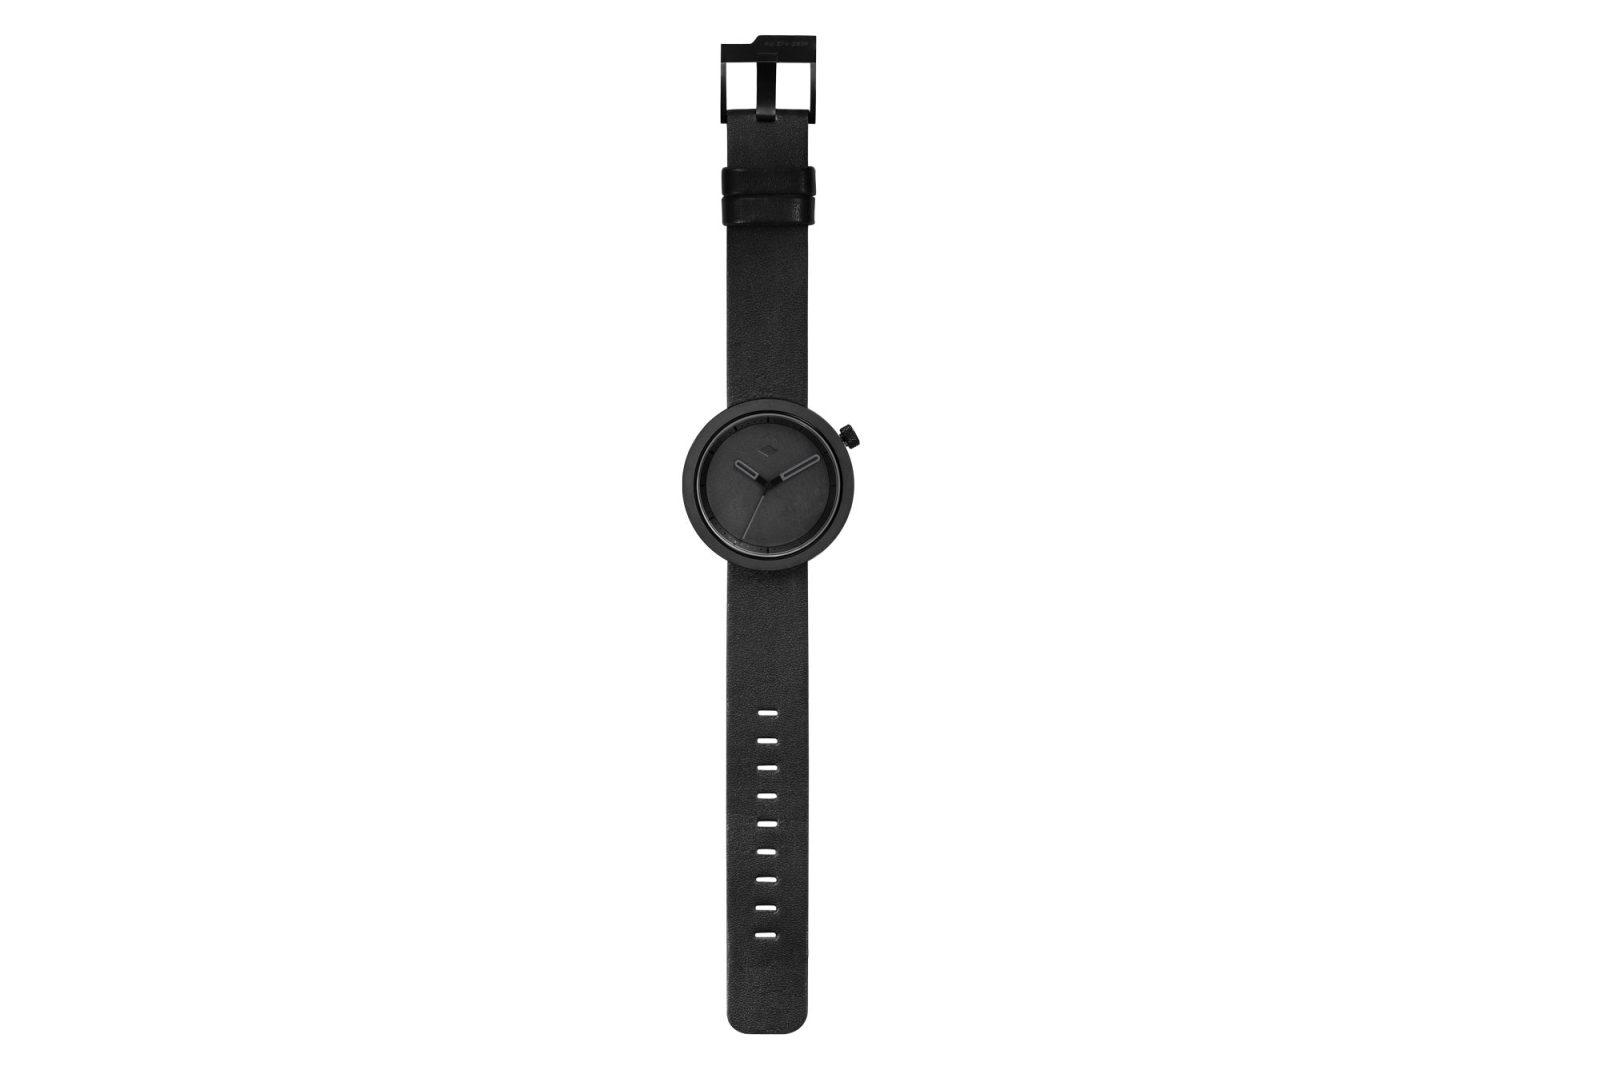 The Masonic Concrete Watch, Charcoal Black-34914